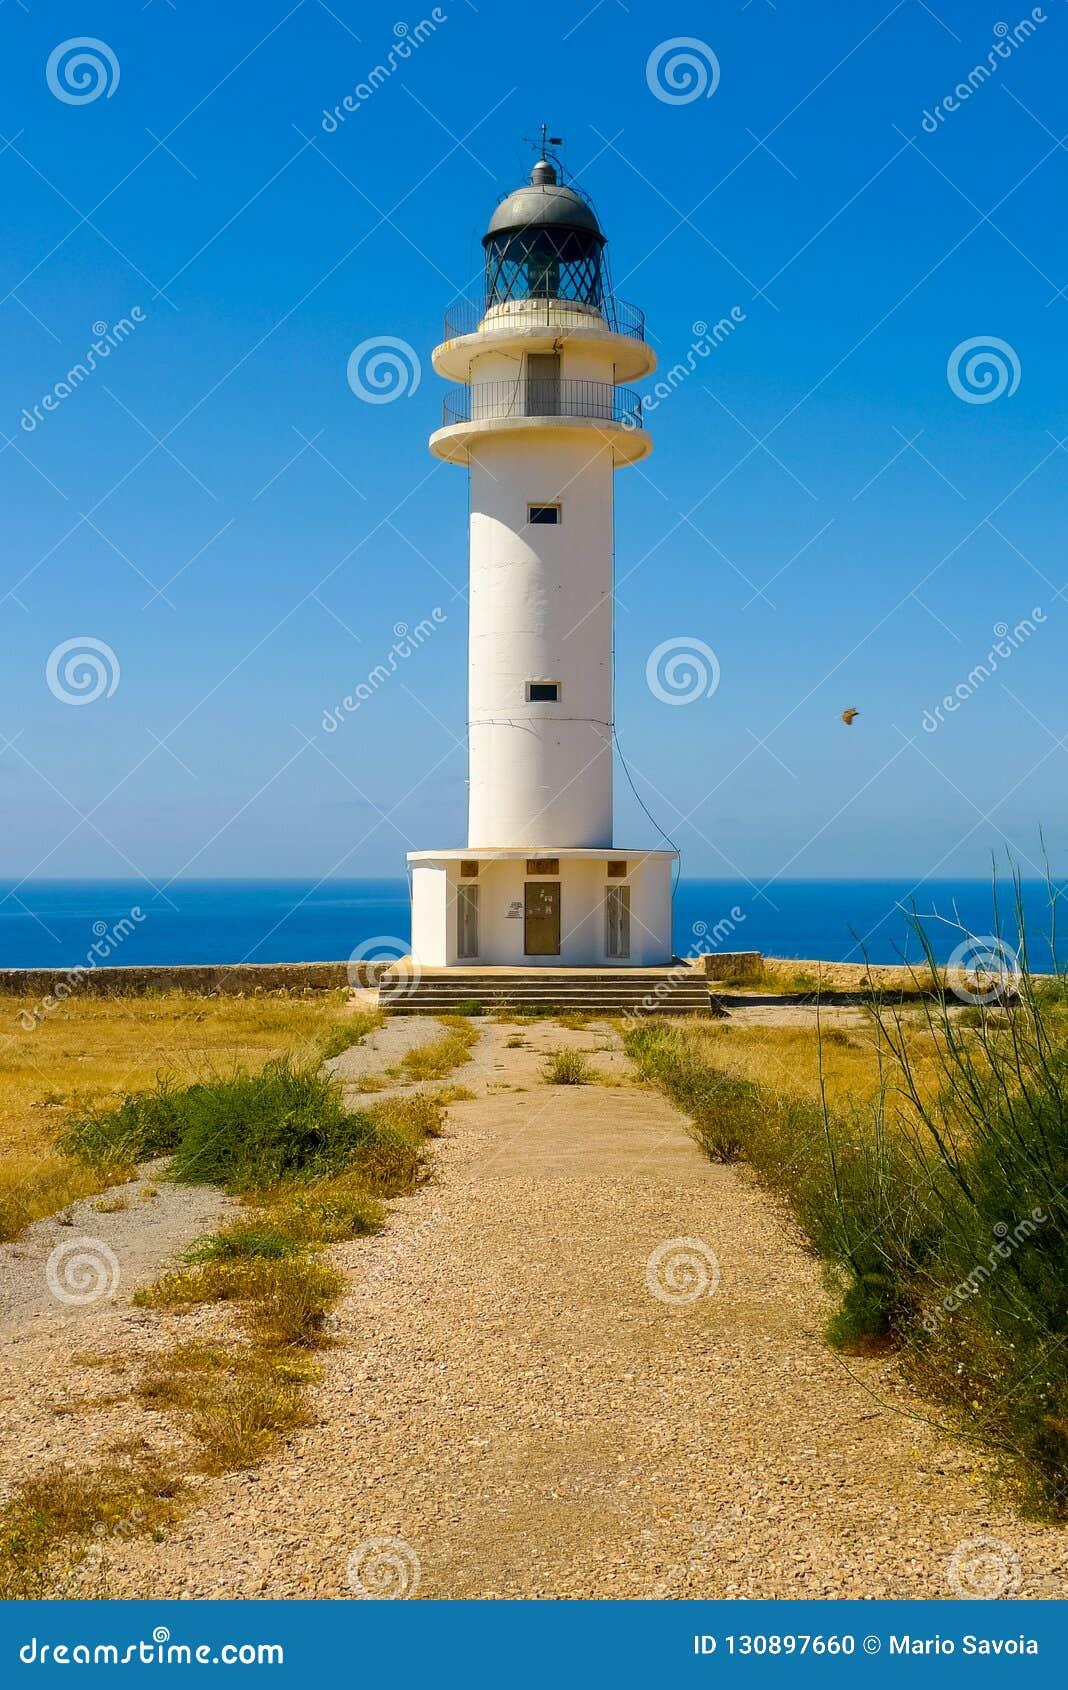 Vertical view of Cap de Barbaria lighthouse